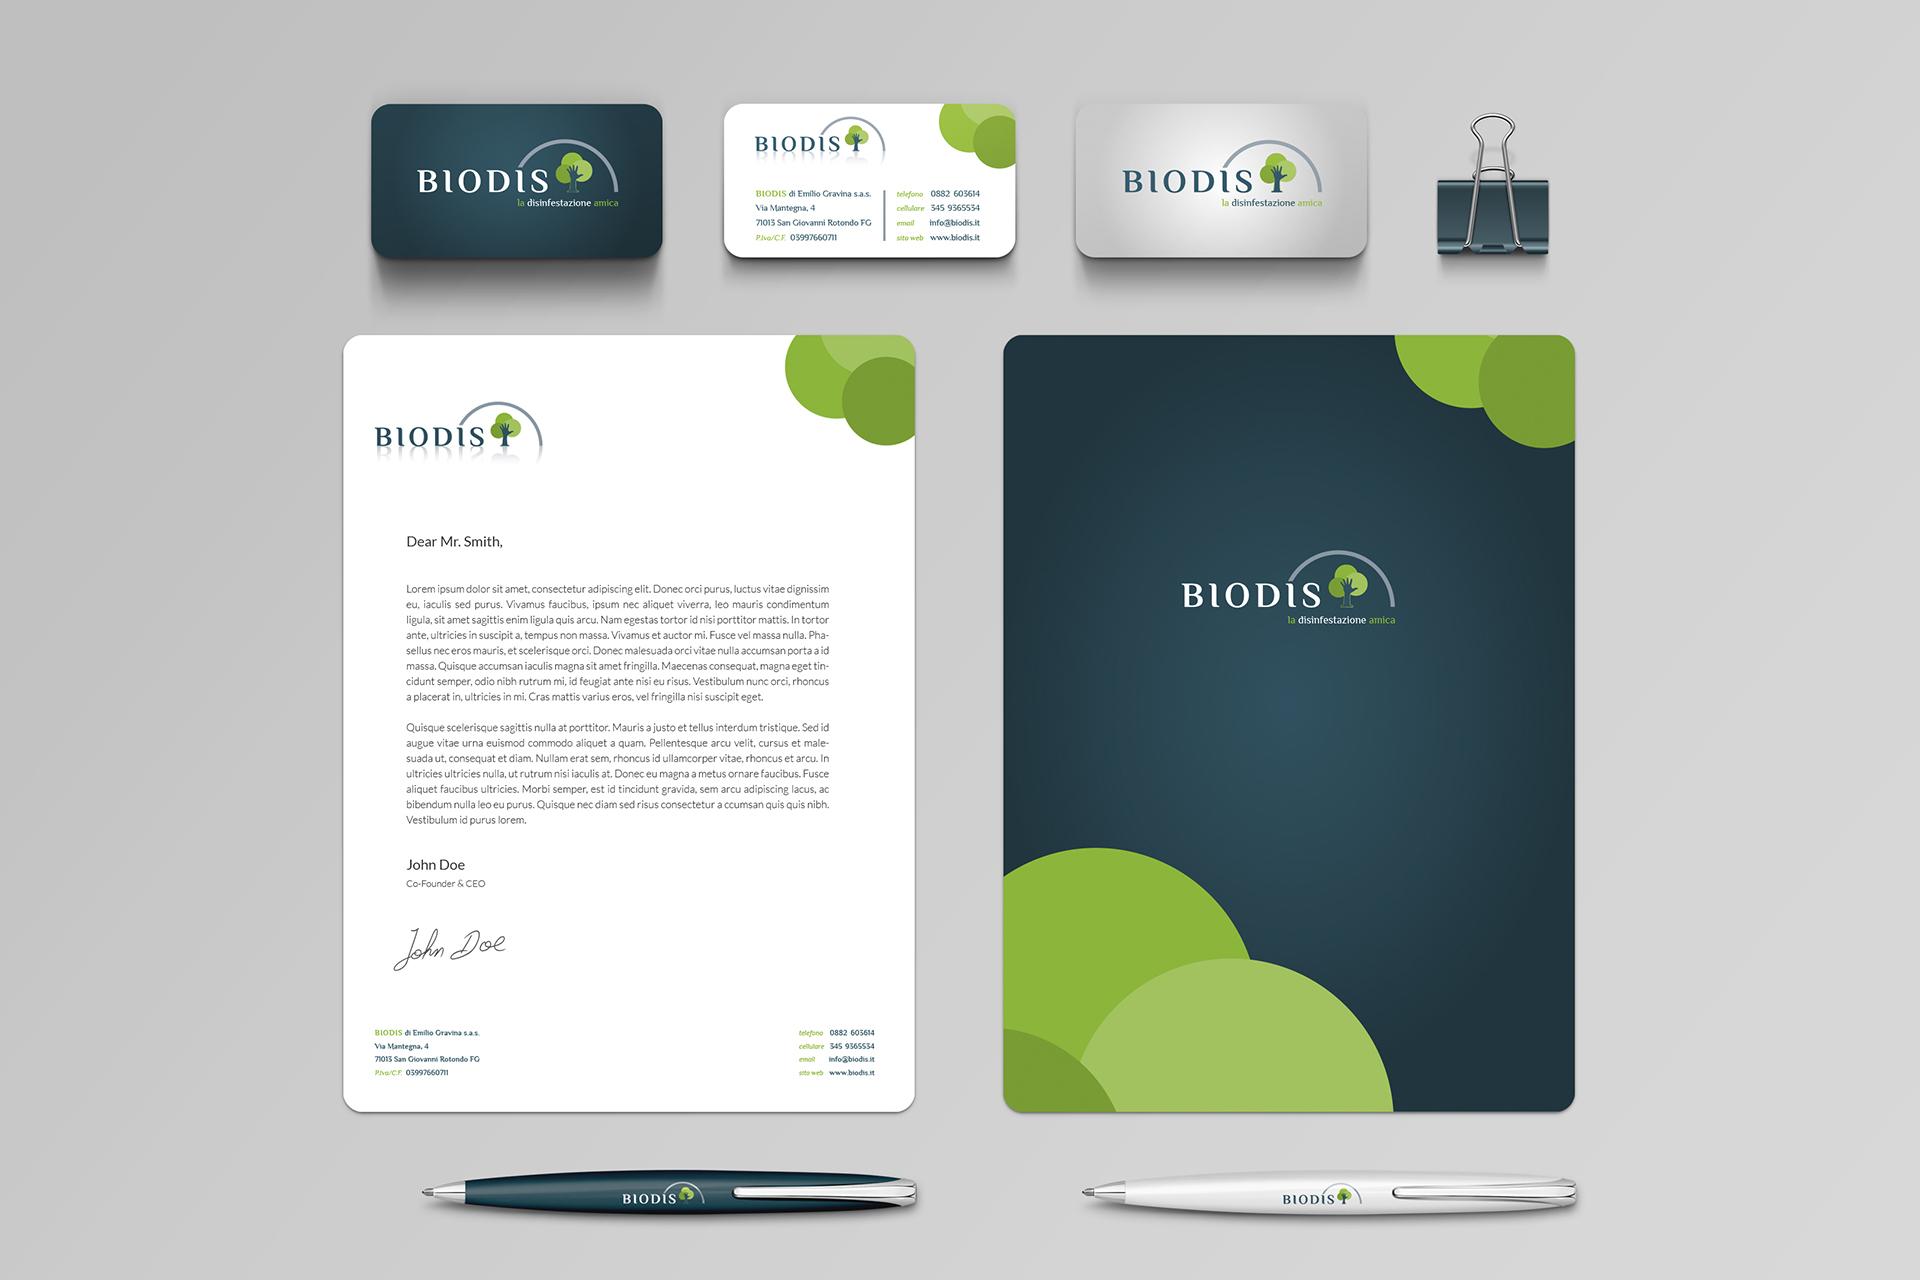 BIODIS Branding Identity Mockup